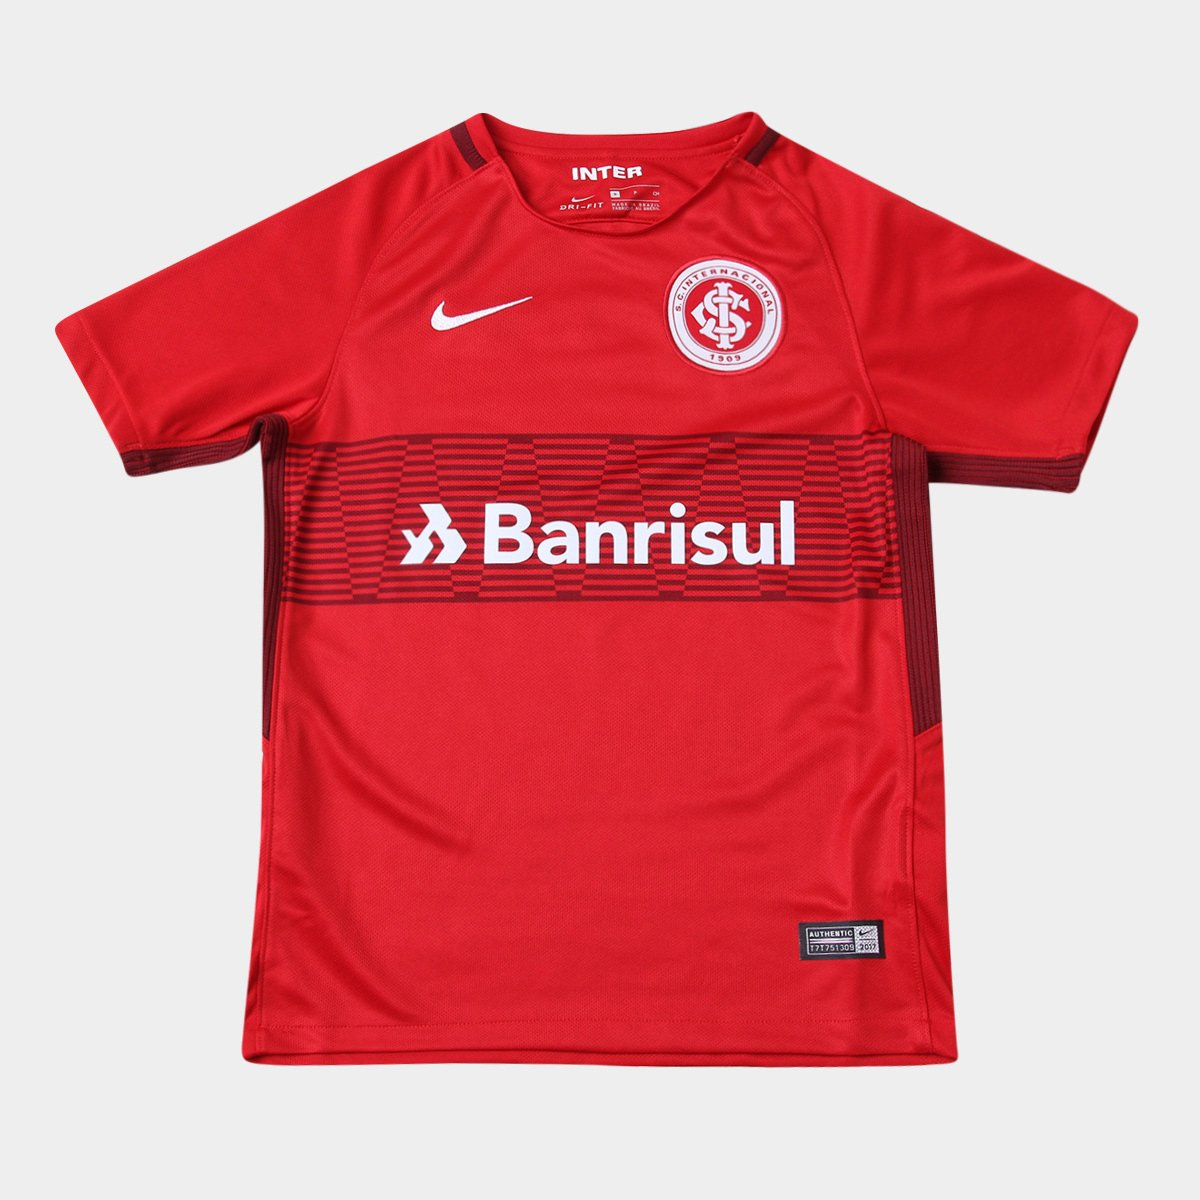 Camisa Internacional Juvenil I 17 18 s n° Torcedor Nike - Compre ... e76c18b0717f6